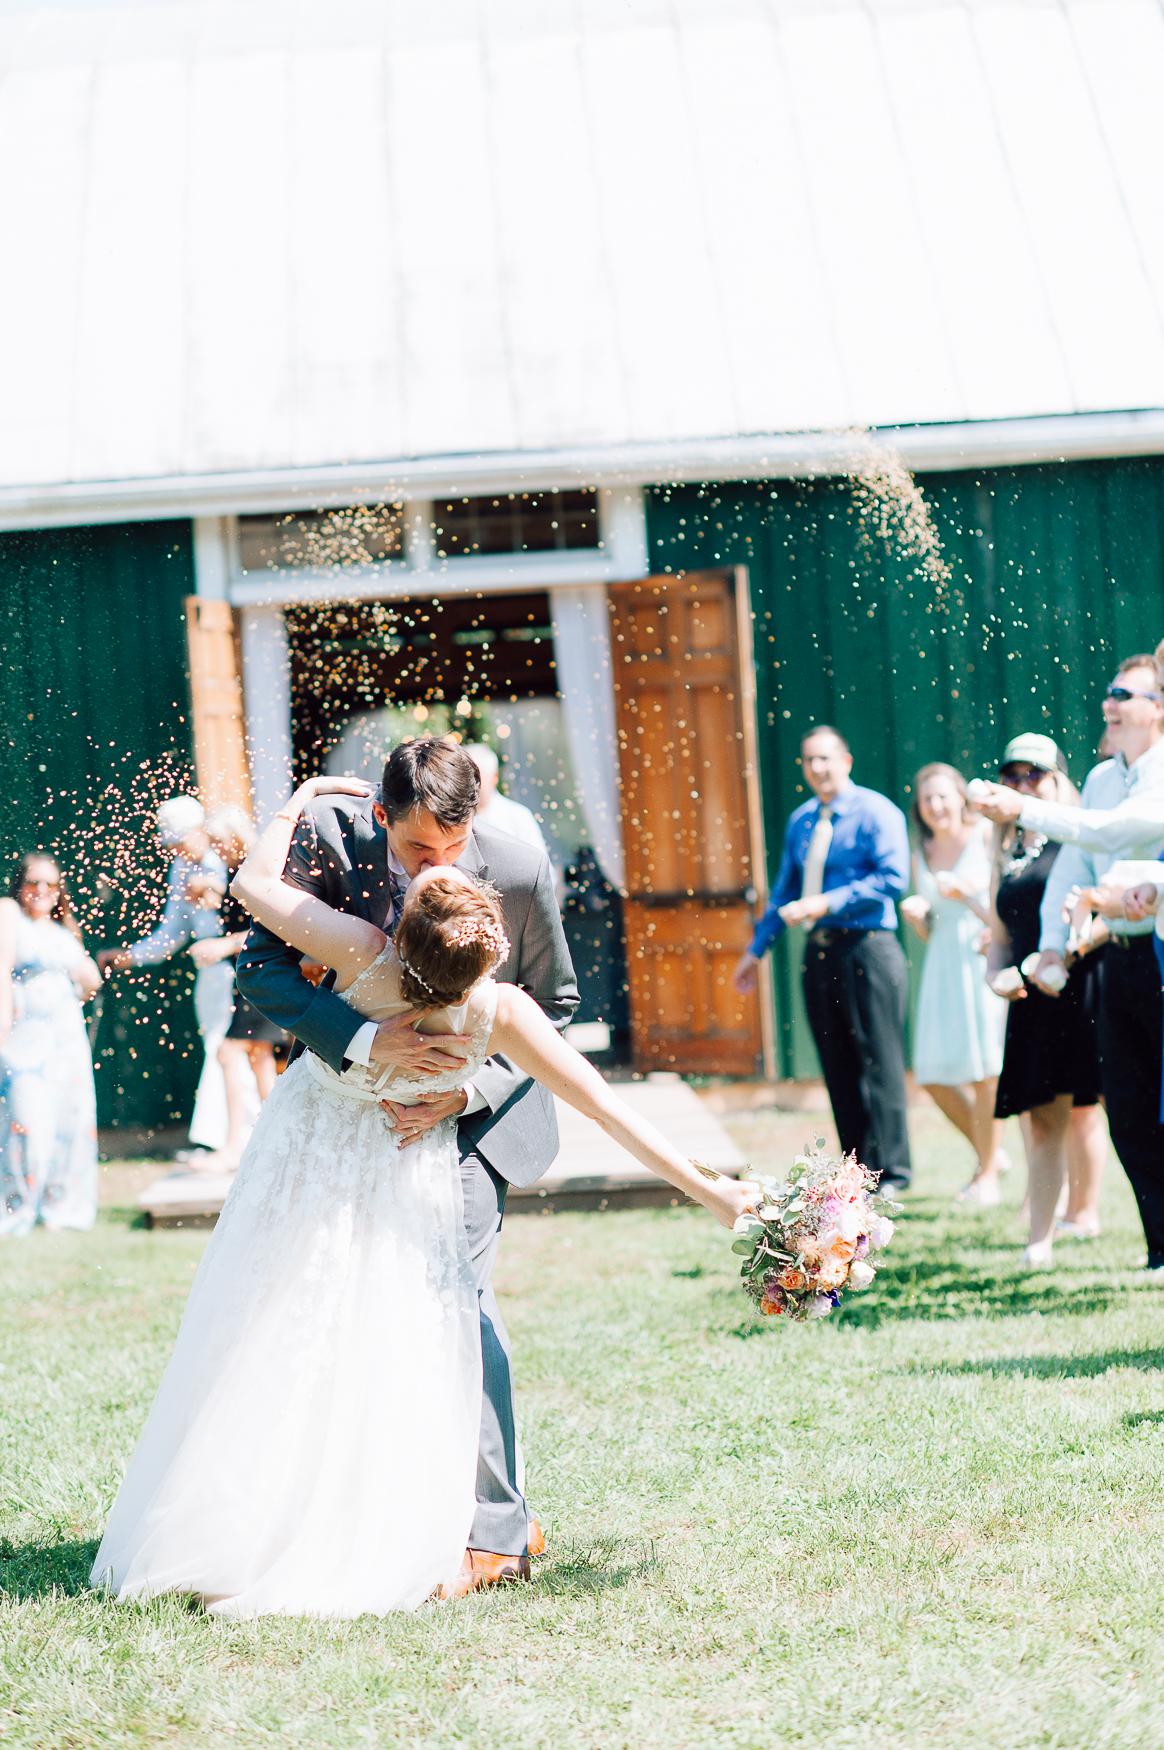 virginiawedding_theGlasgowFarm_rusticwedding_fredericksburg_youseephotography_CarolineDale (110).jpg